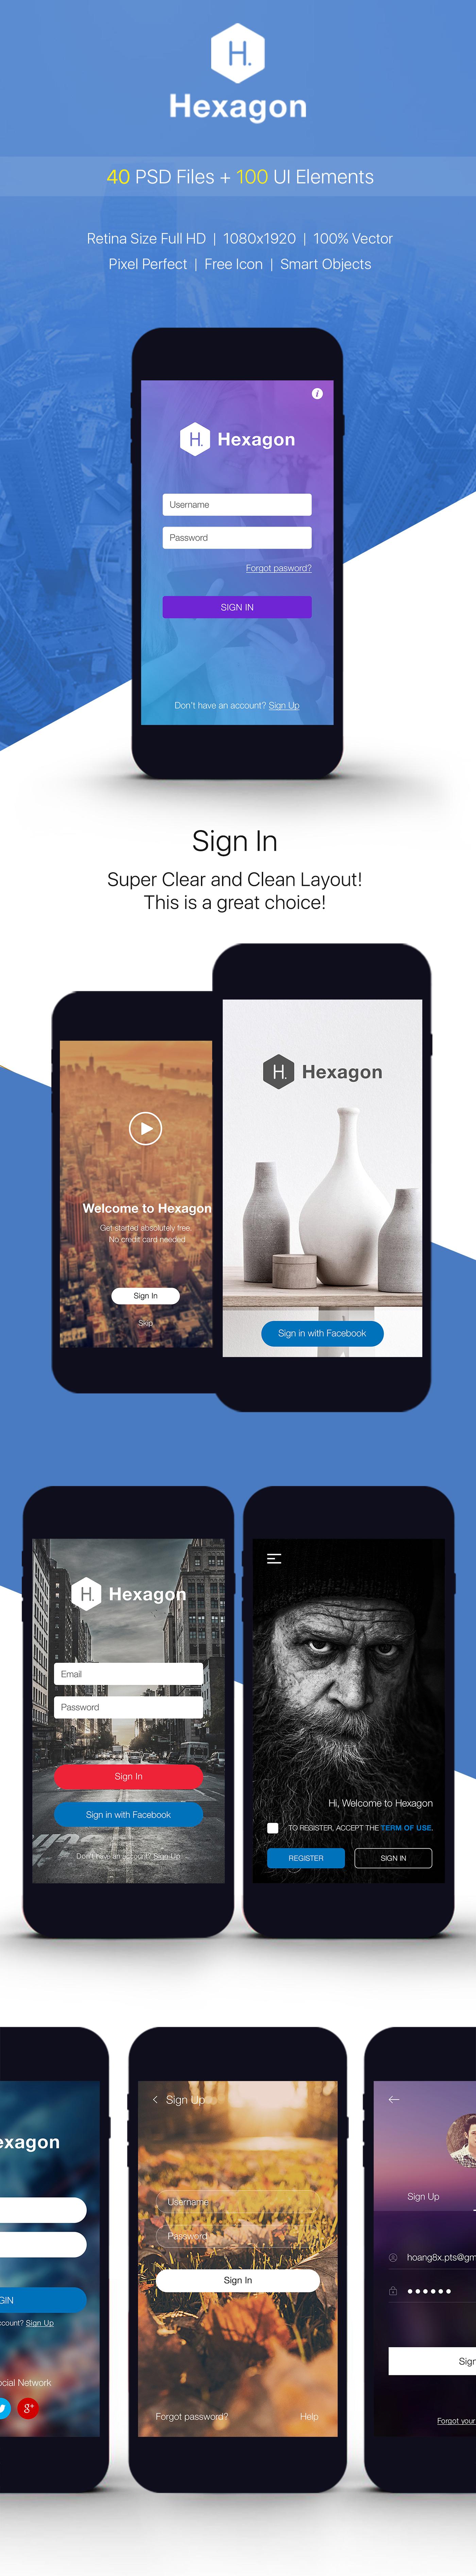 SignUp / Login - Mobile Form UI kit example image 2